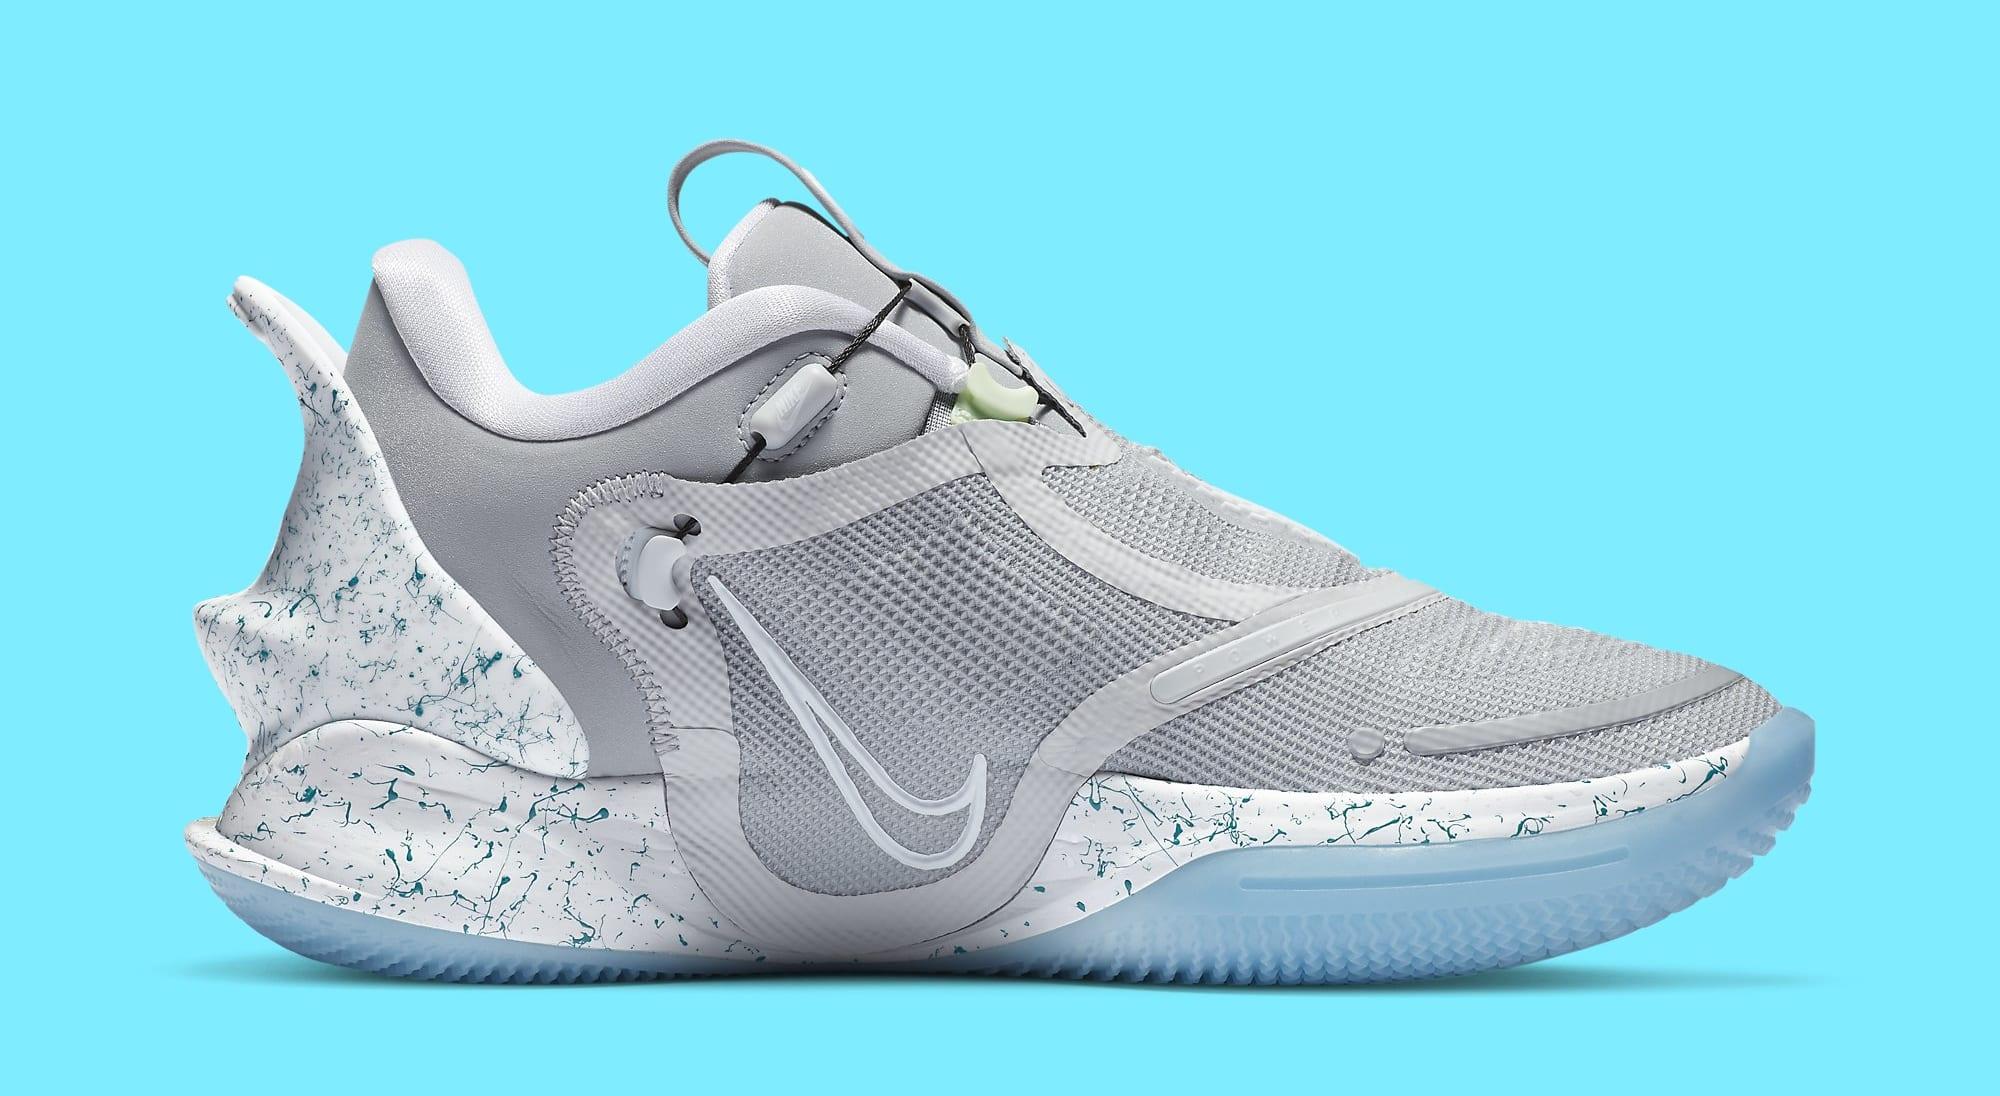 Nike Adapt BB 2.0 'Mag' BQ5397-003 Medial